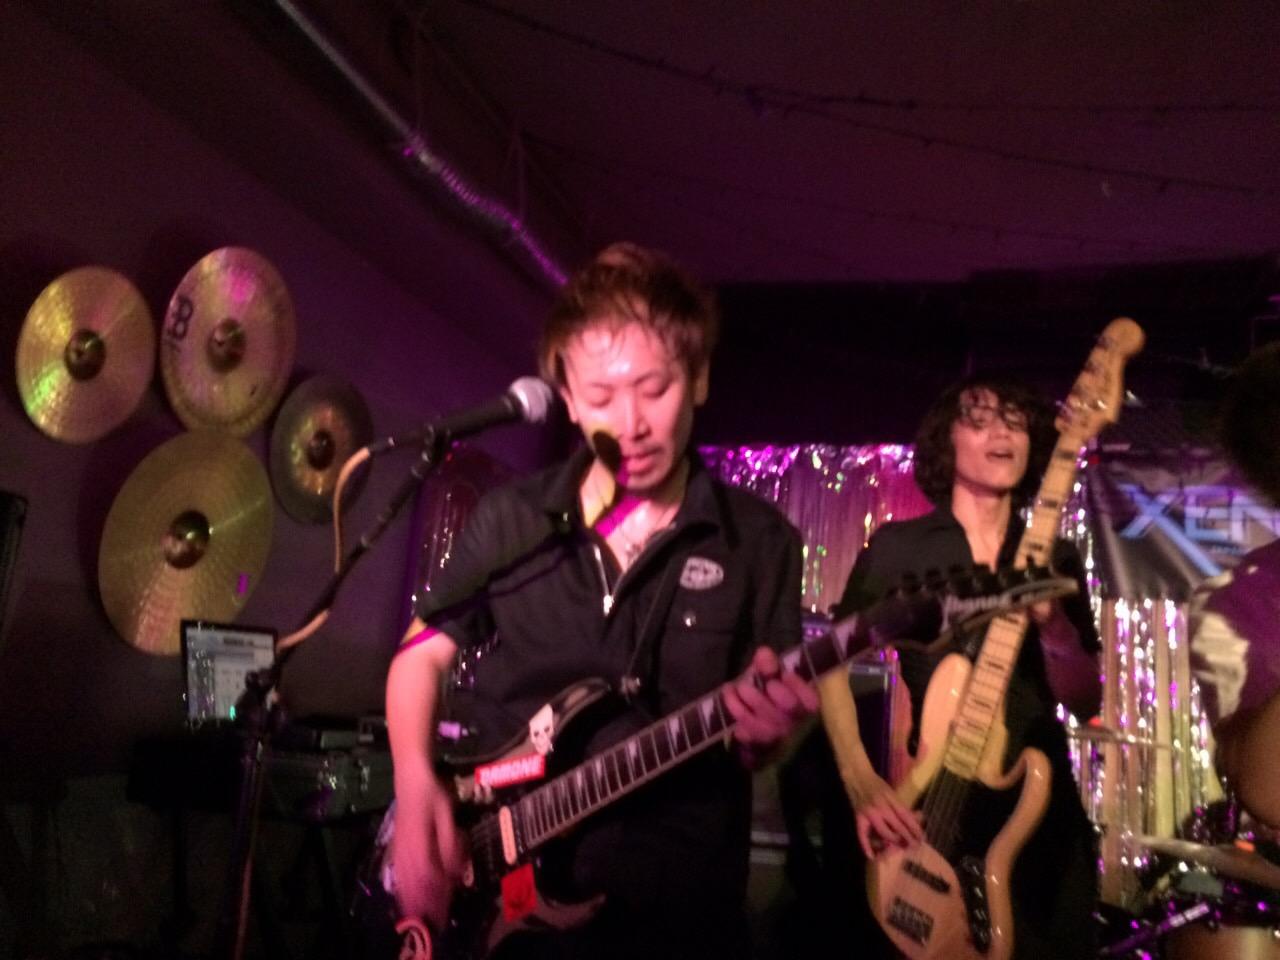 Jrock247-Rhedoric-Amplyfi-Yusuke-Suga-Shigure